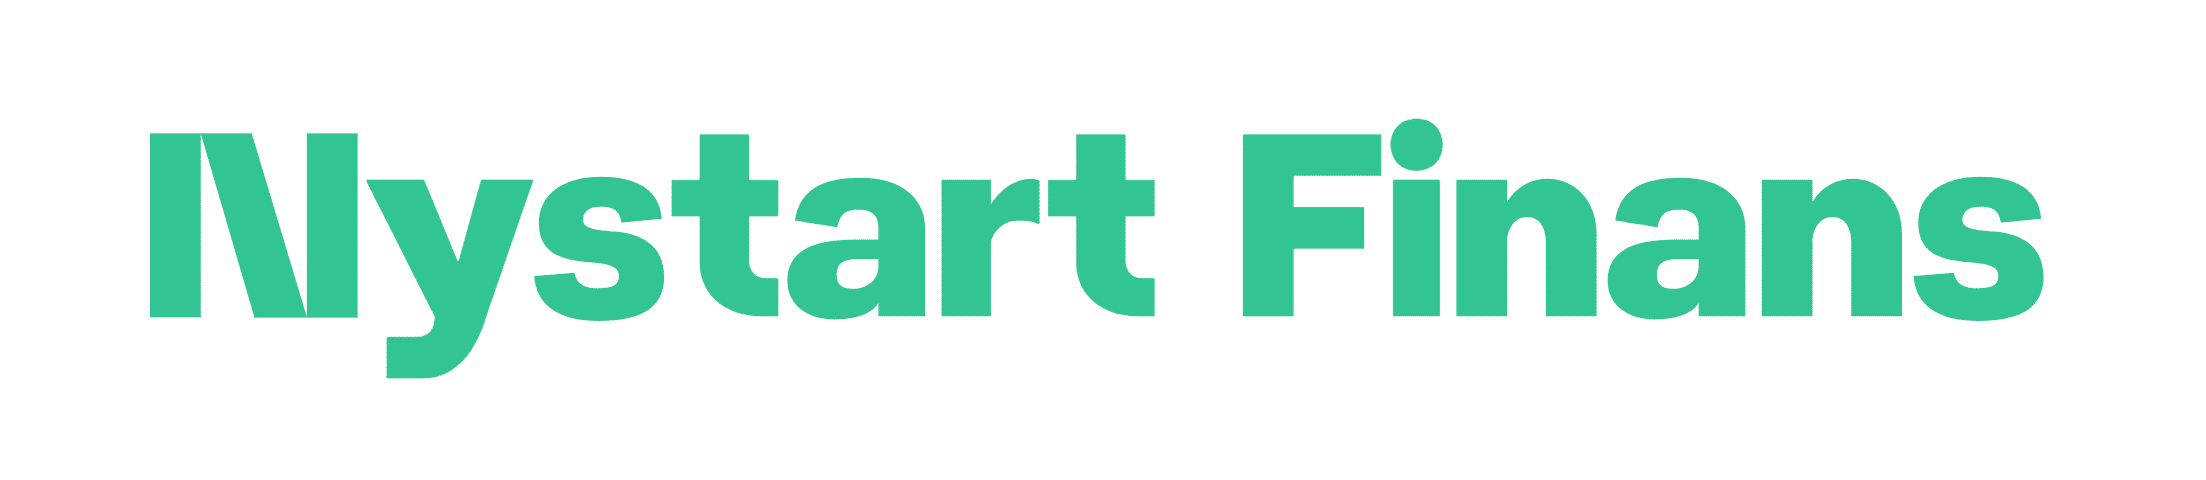 Nystart Finans